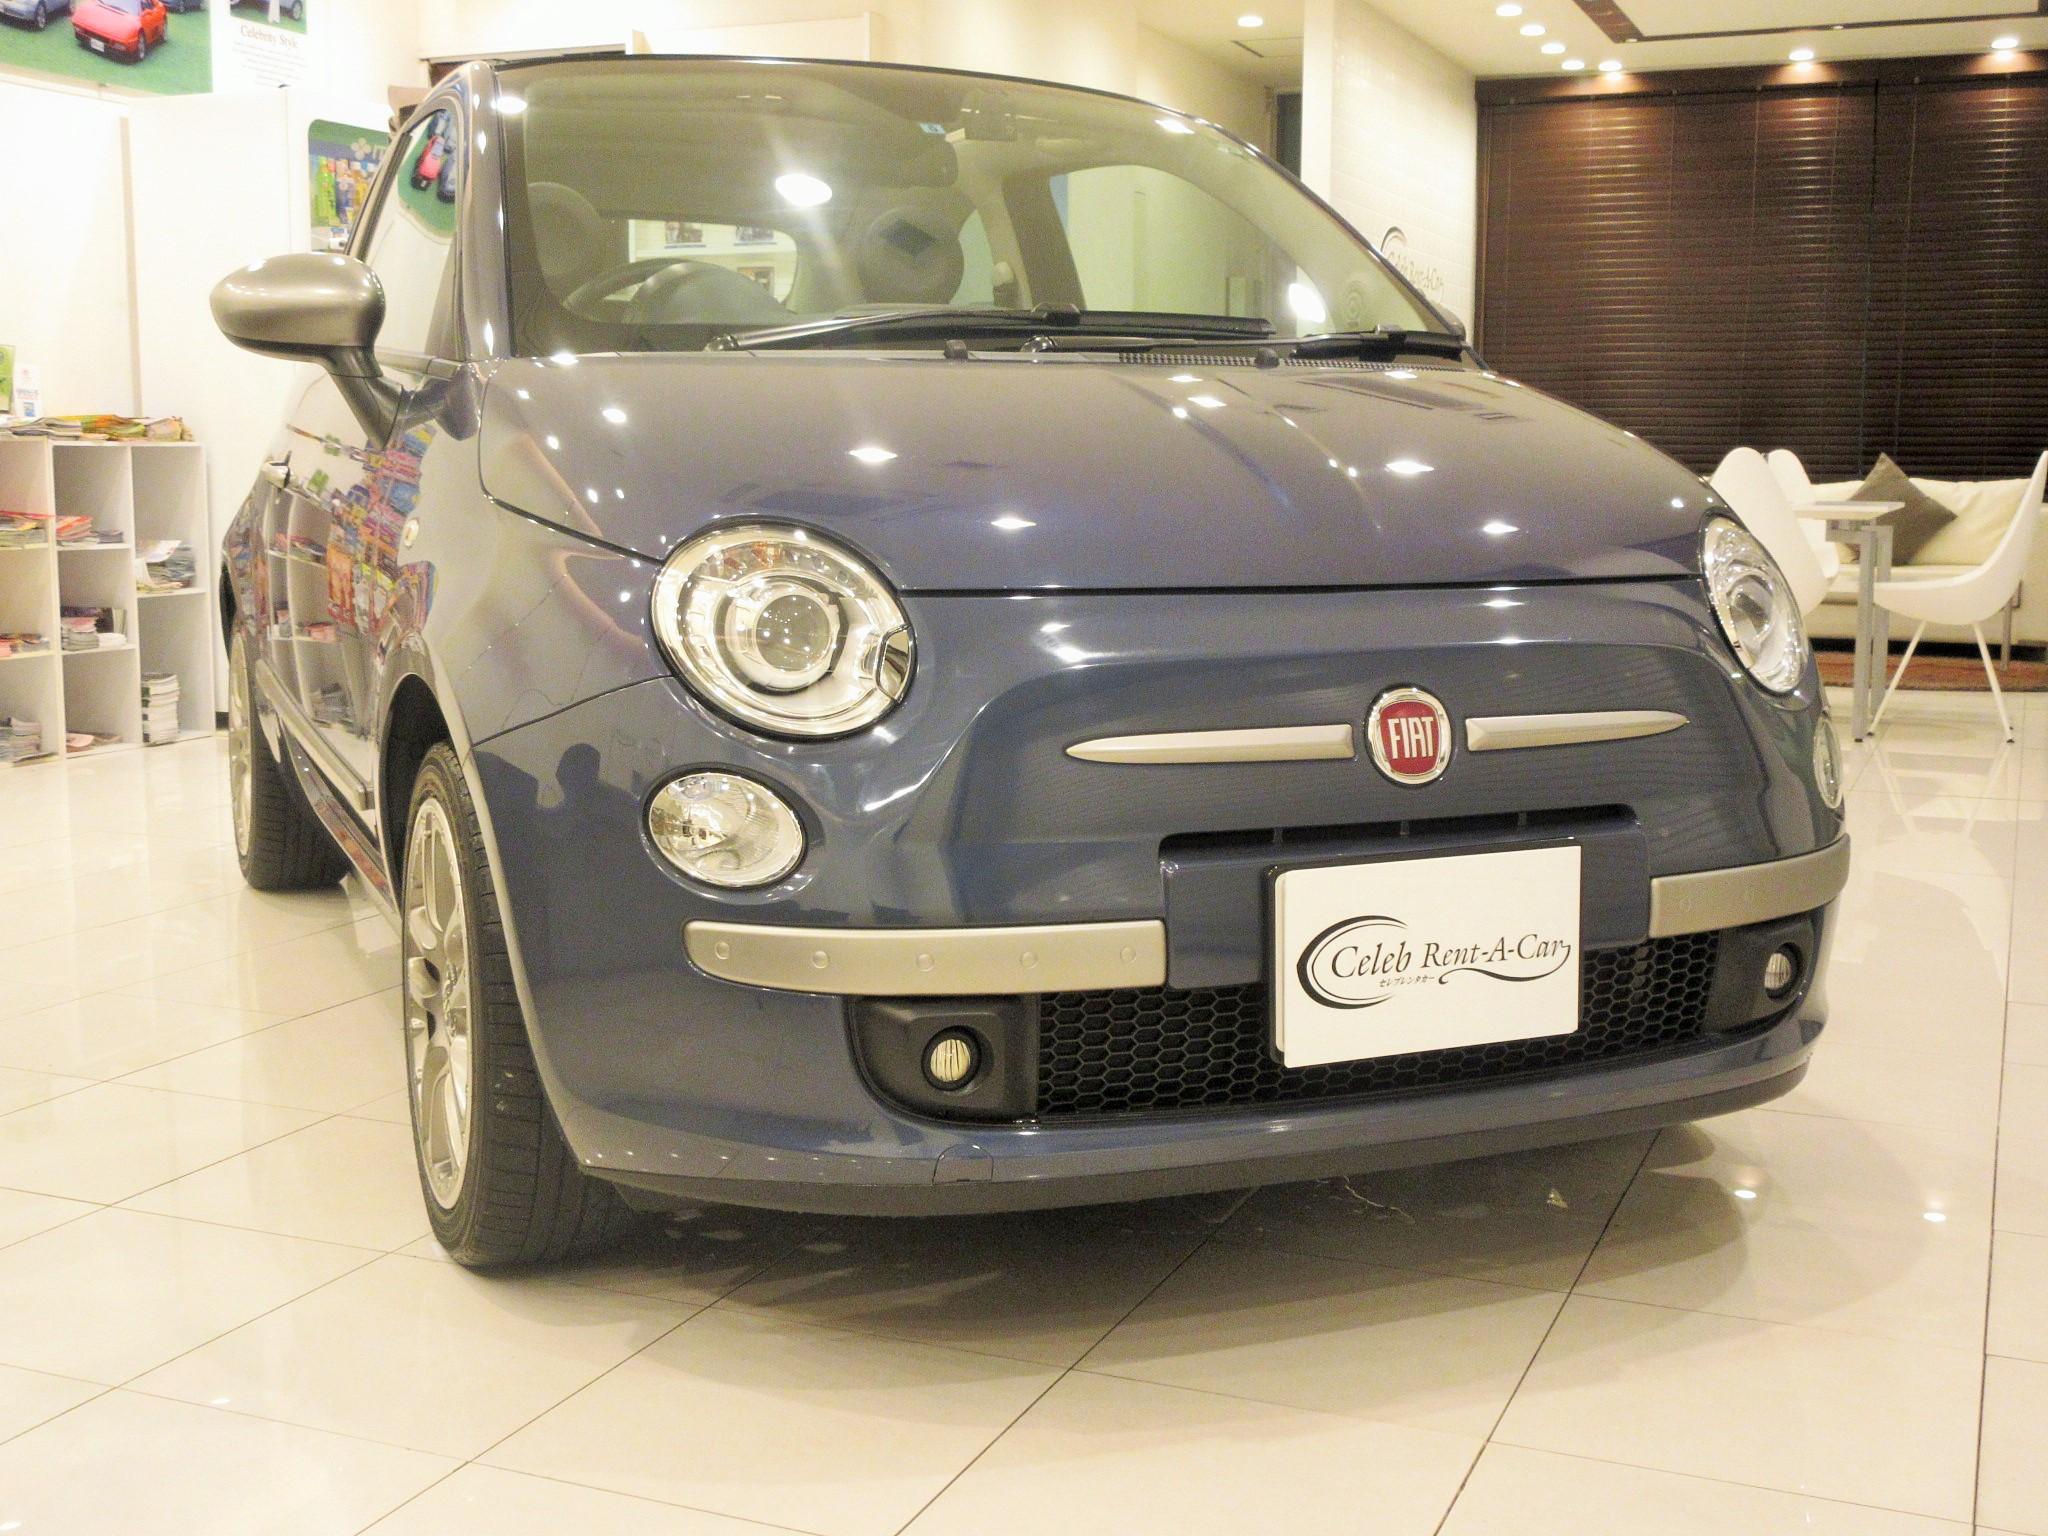 FIAT-500C By DIESEL